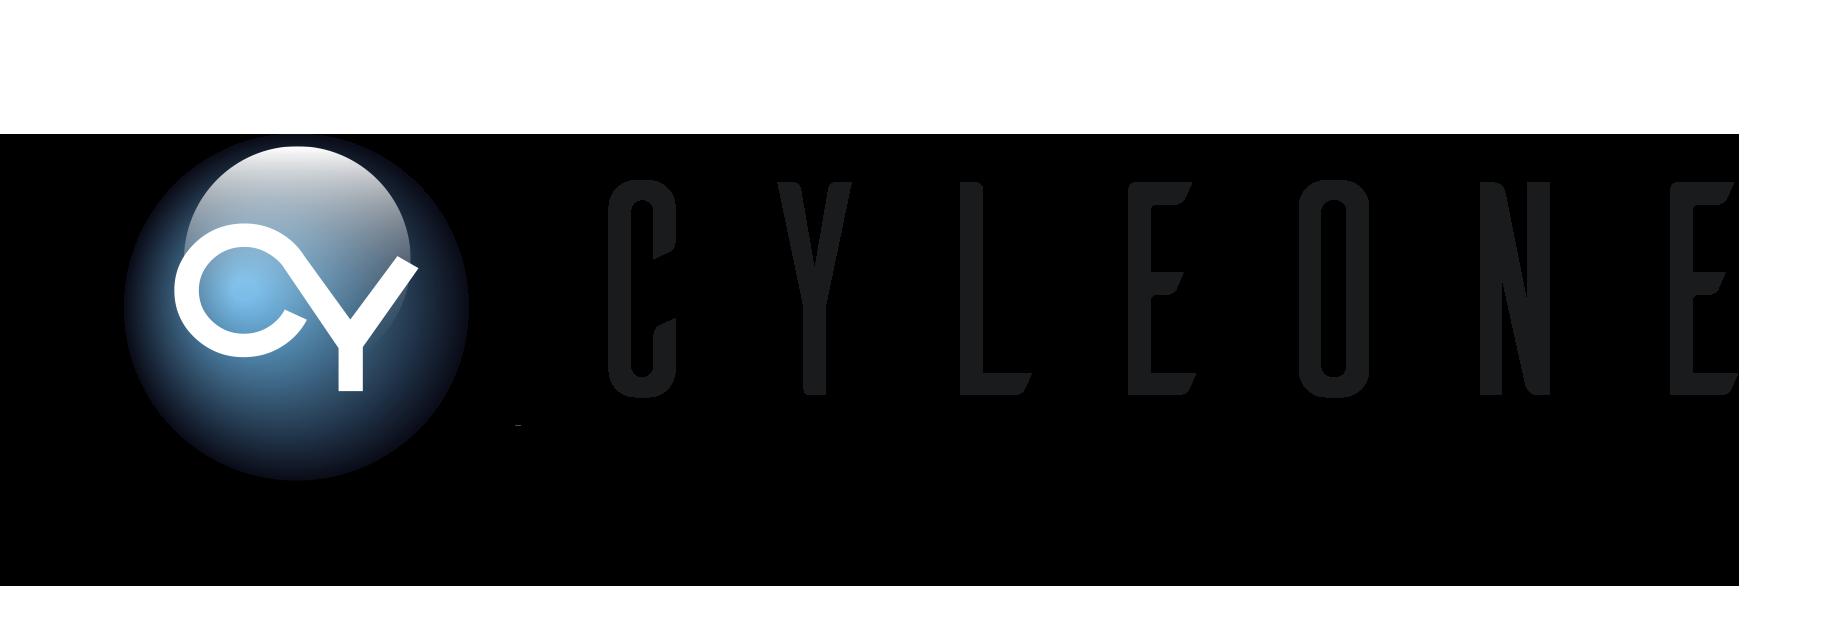 logo-cyleone-2019-01